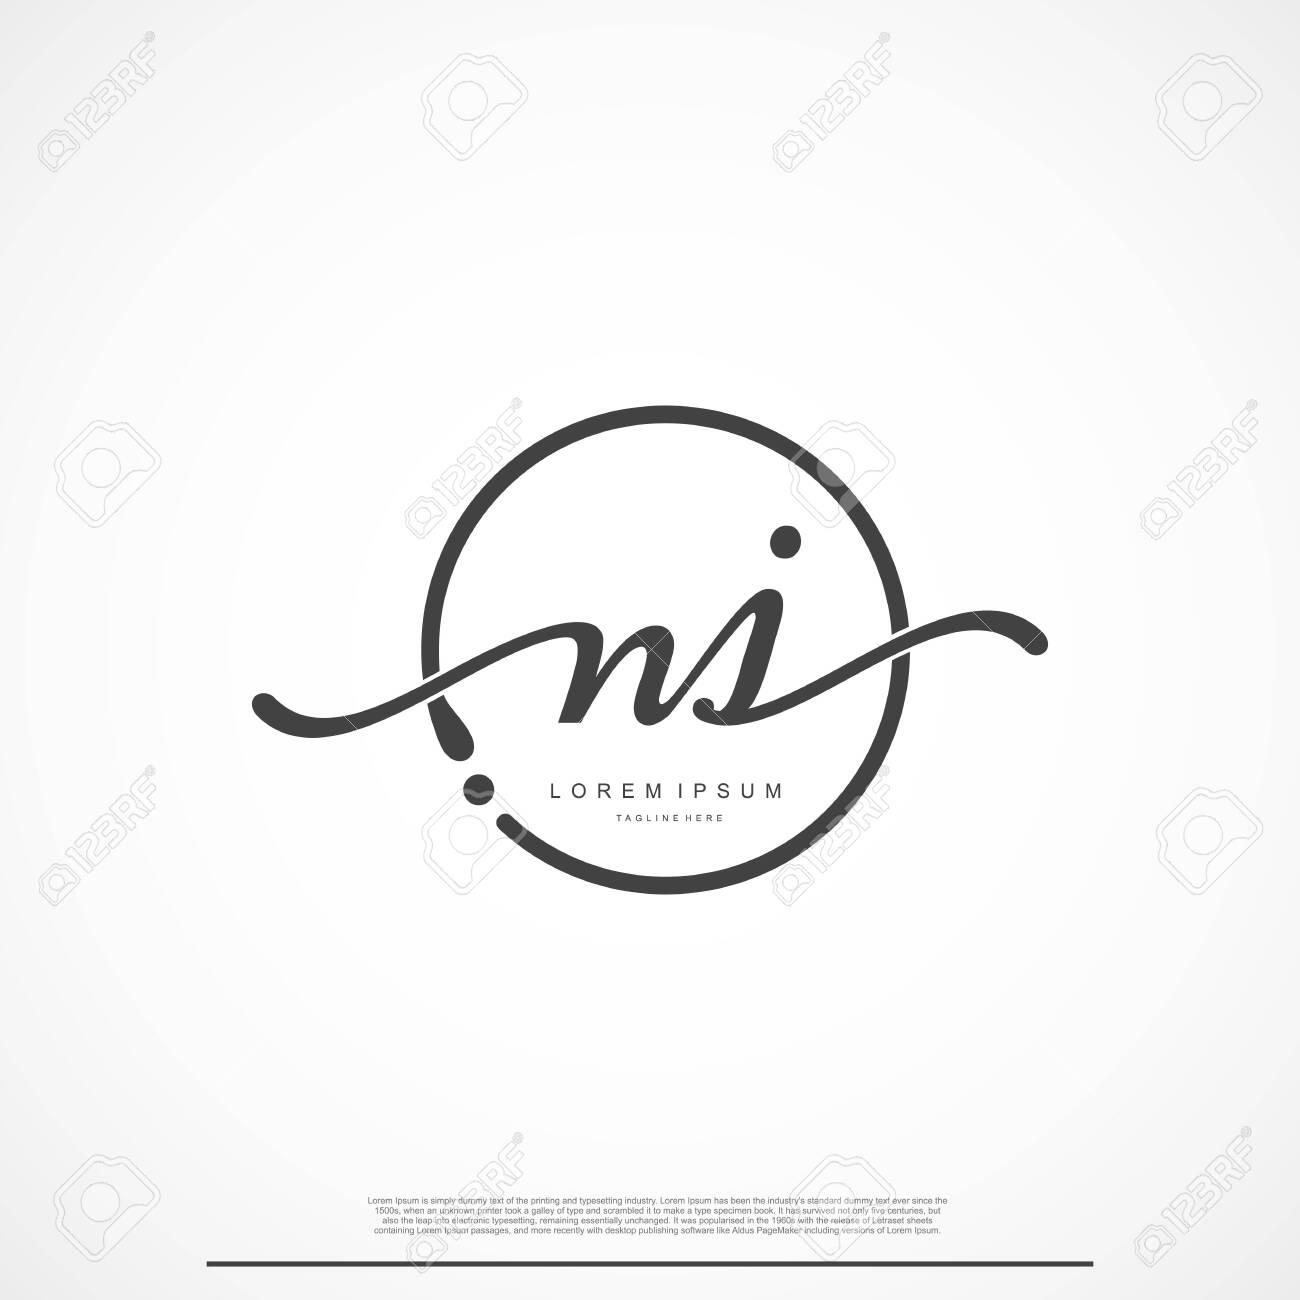 Elegant Signature Initial Letter NJ Logo With Circle. - 133234798